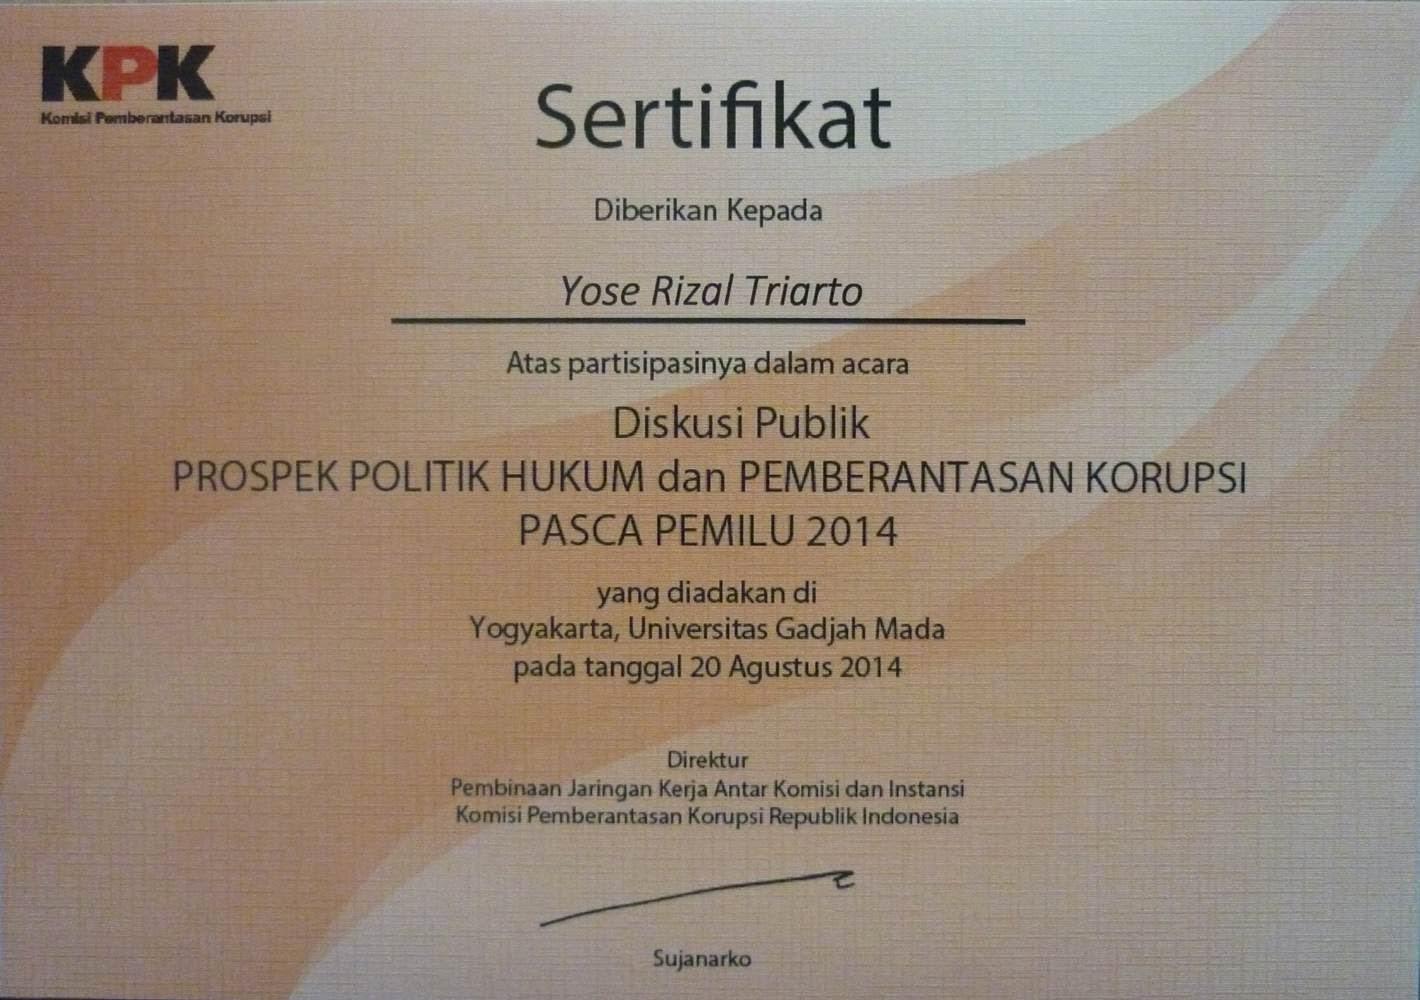 Diskusi Publik KPK-ICW-UGM